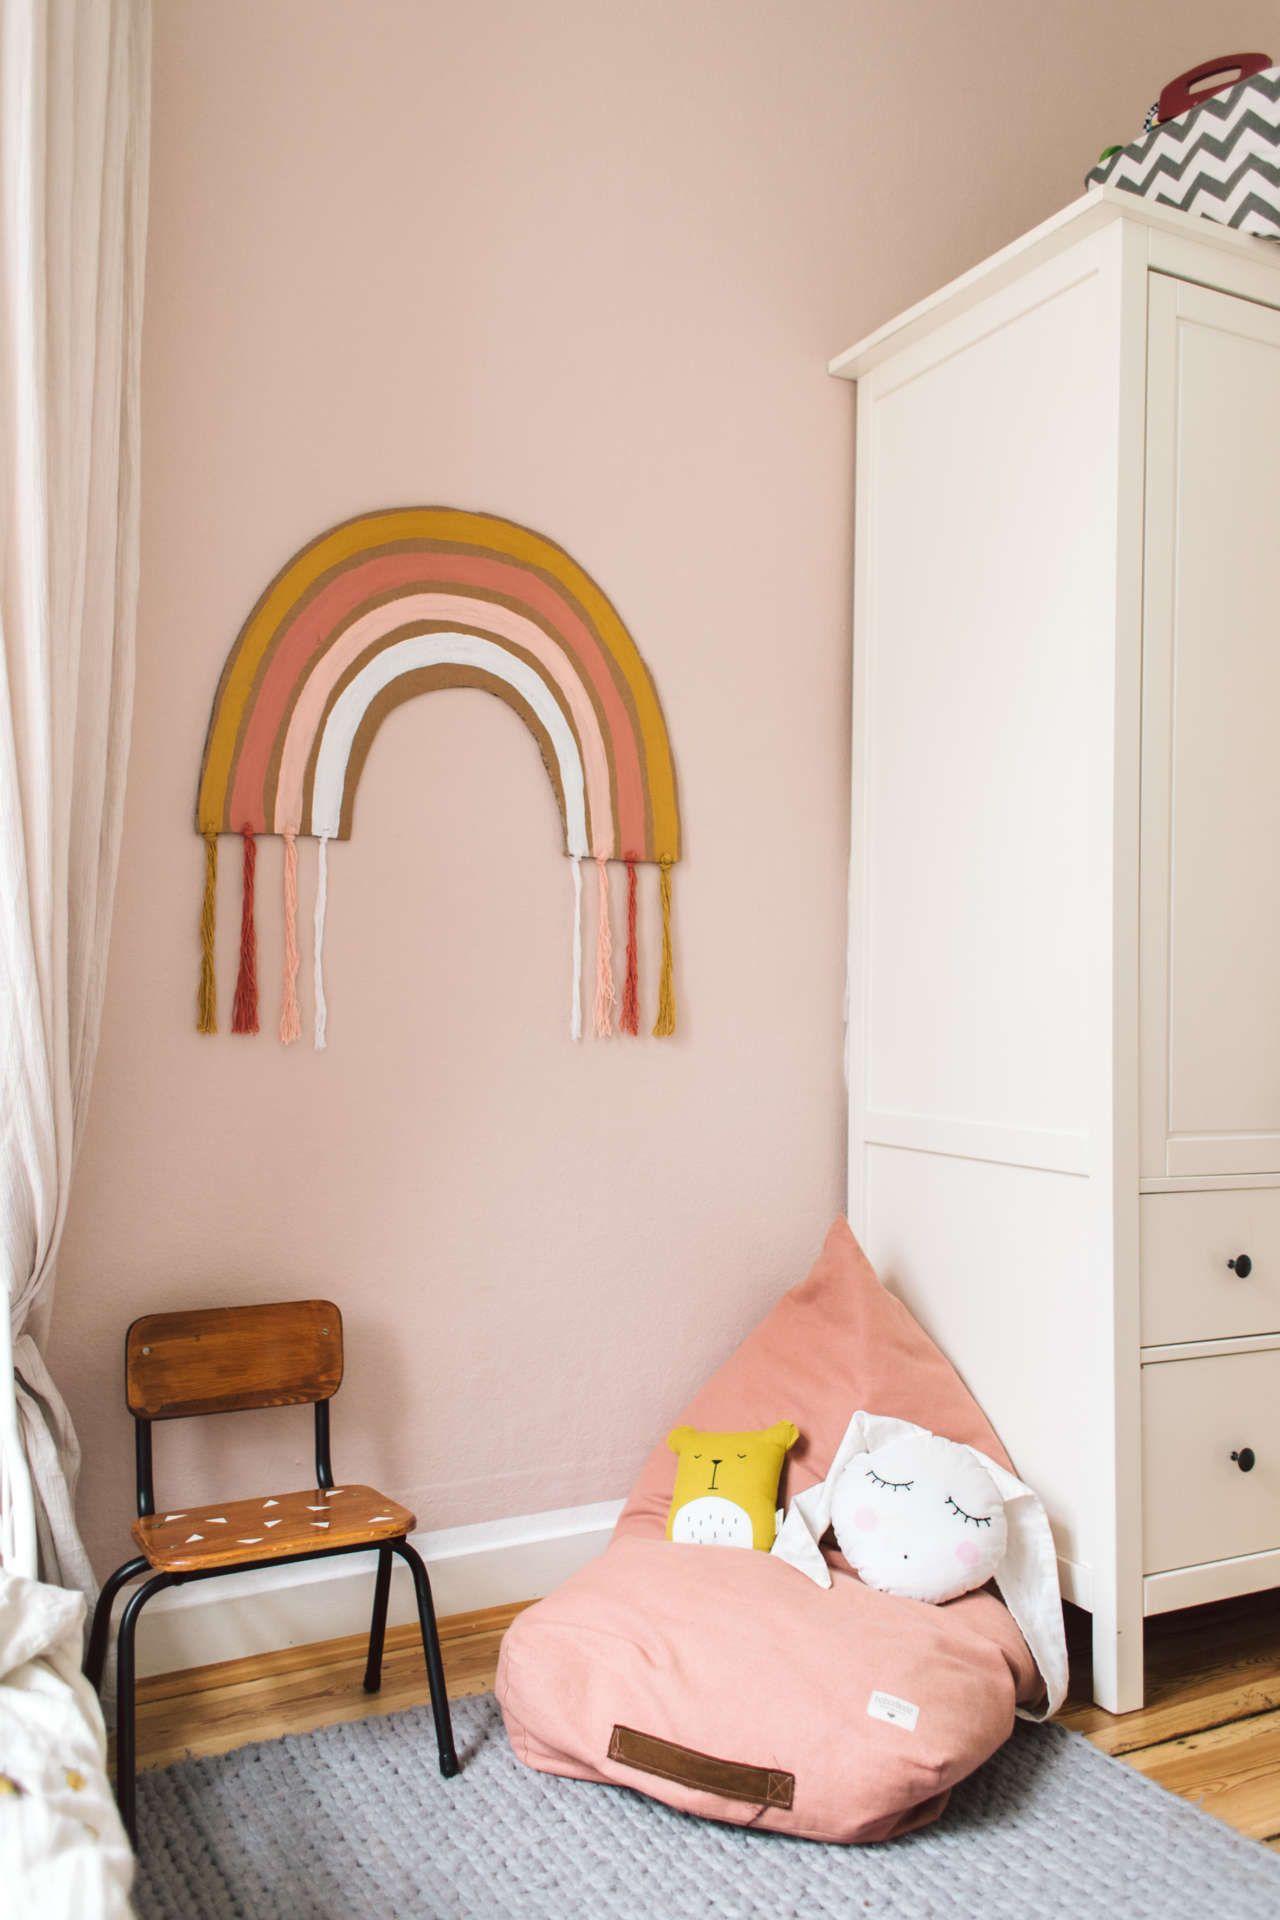 Full Size of Kinderzimmer Wanddeko Diy Regenbogen Selber Machen Regal Weiß Regale Sofa Küche Kinderzimmer Kinderzimmer Wanddeko